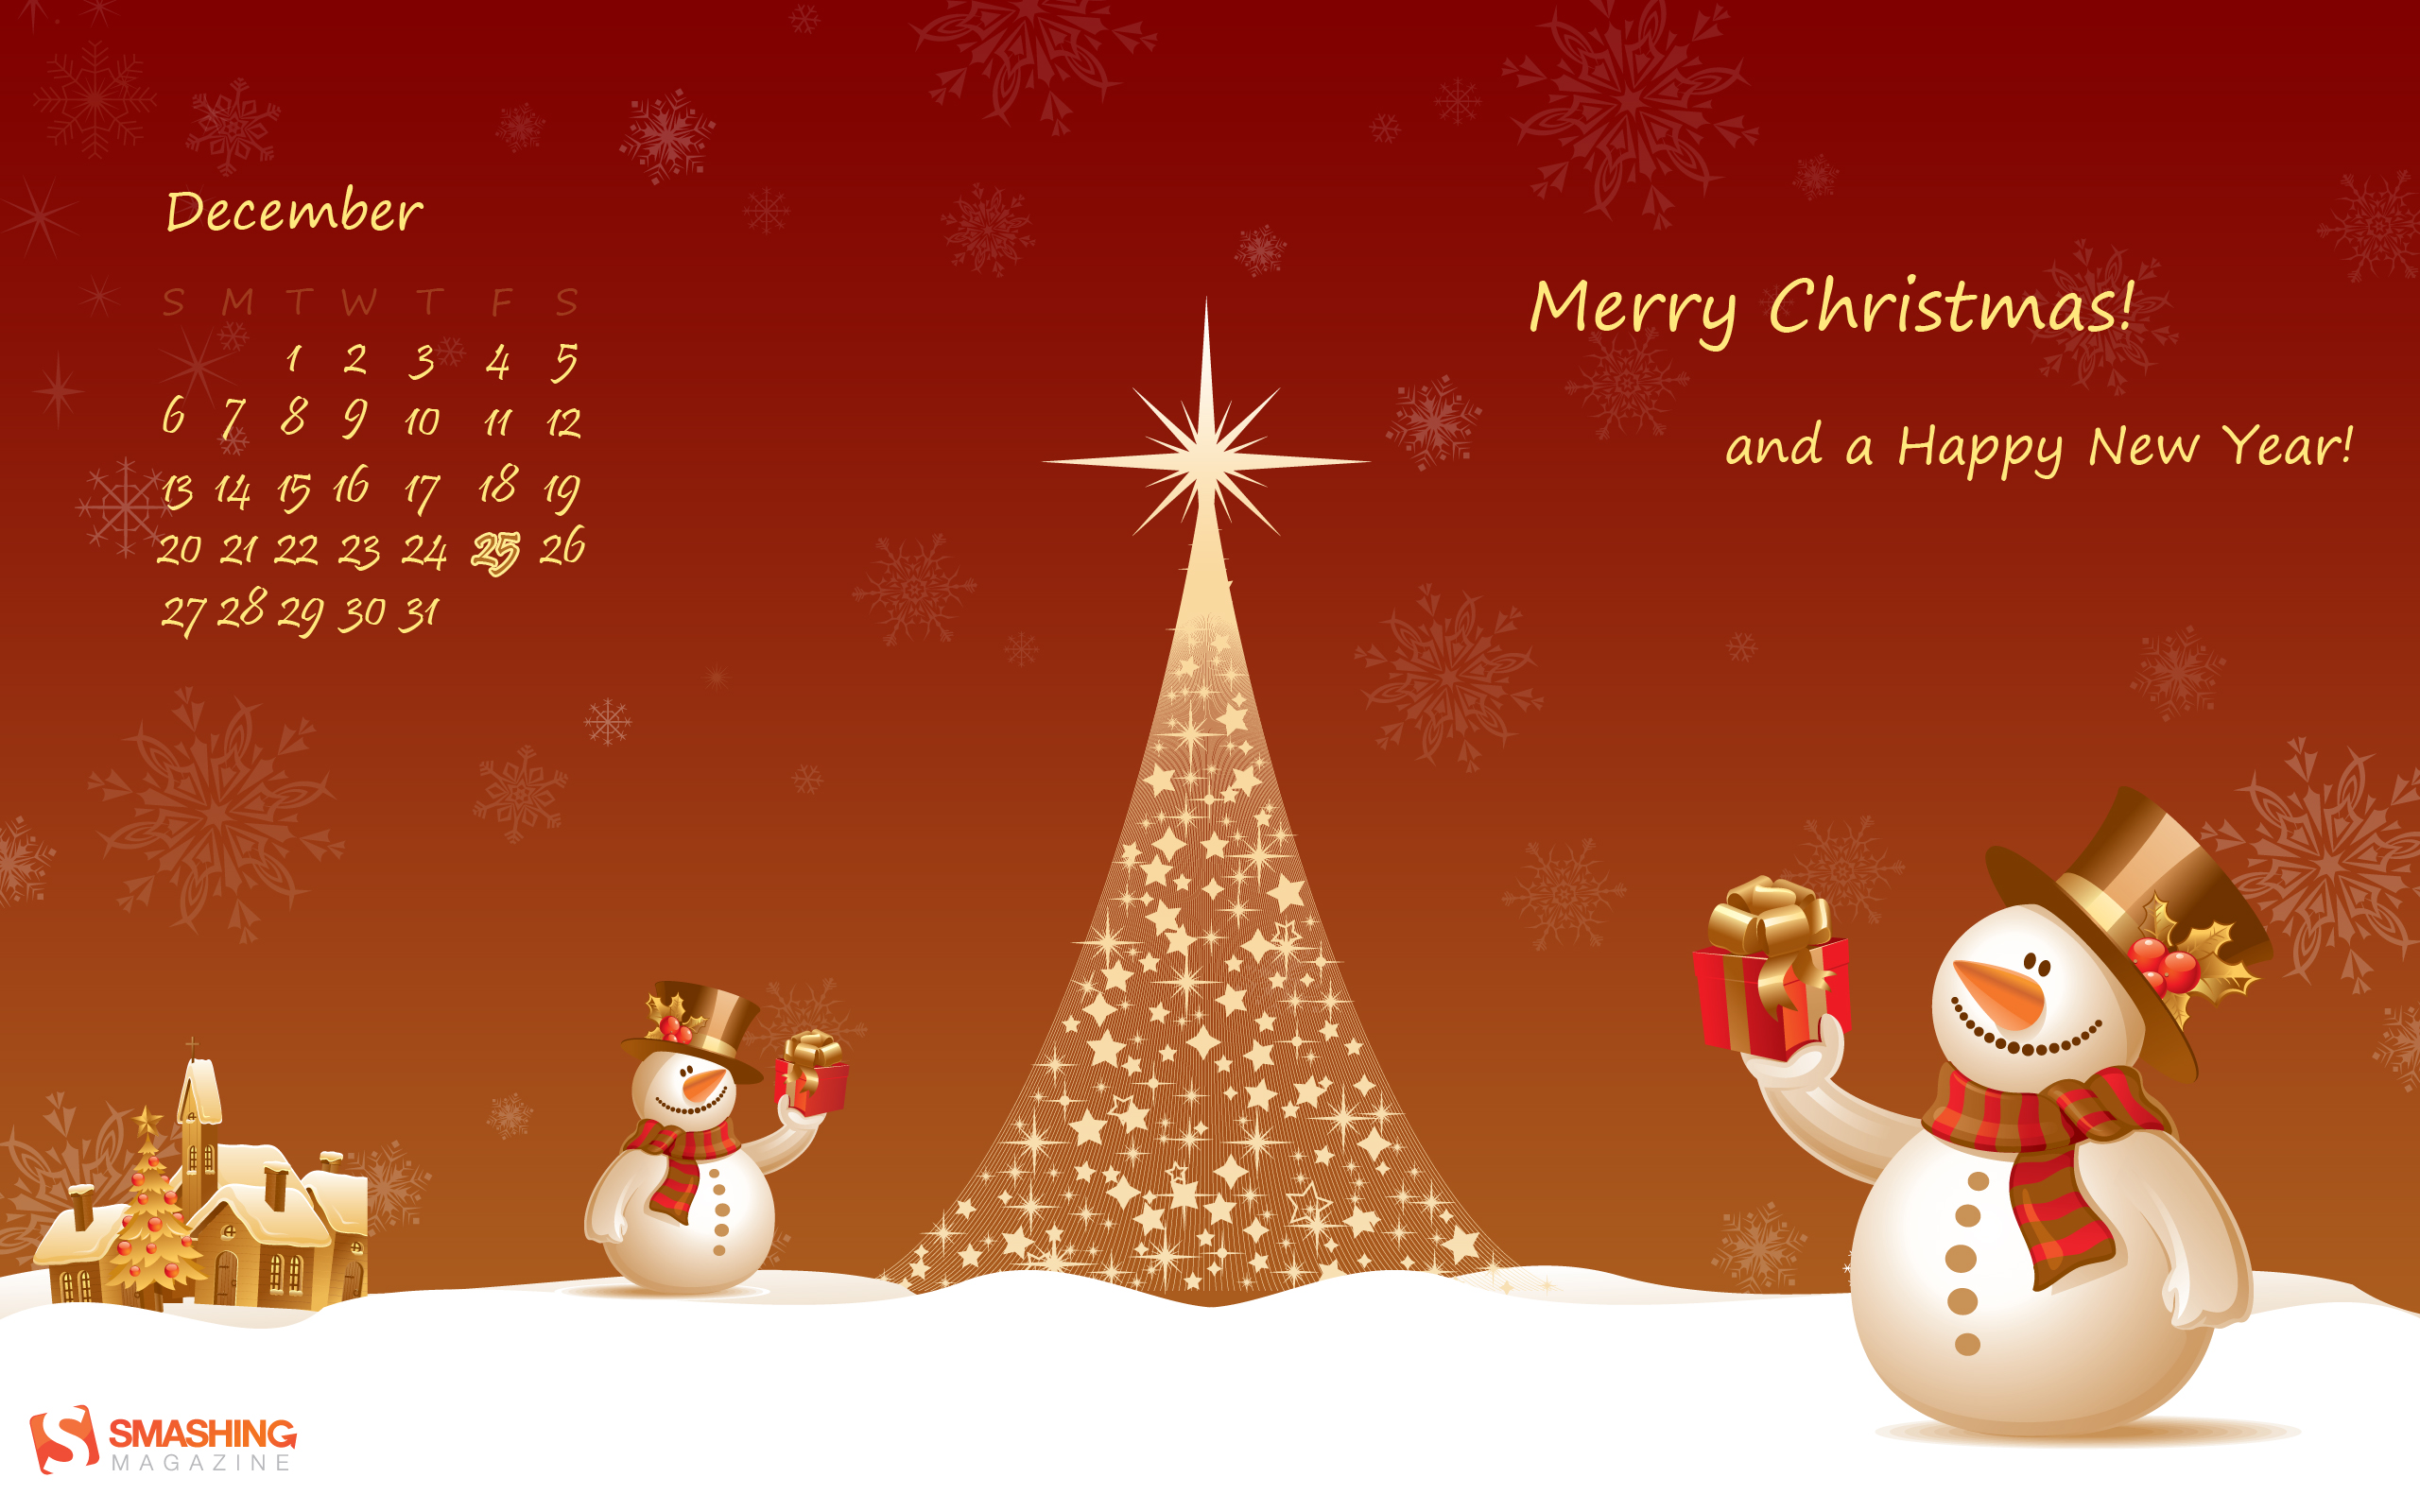 as desktop background desktop wallpapers holidays new year wallpapers 2560x1600